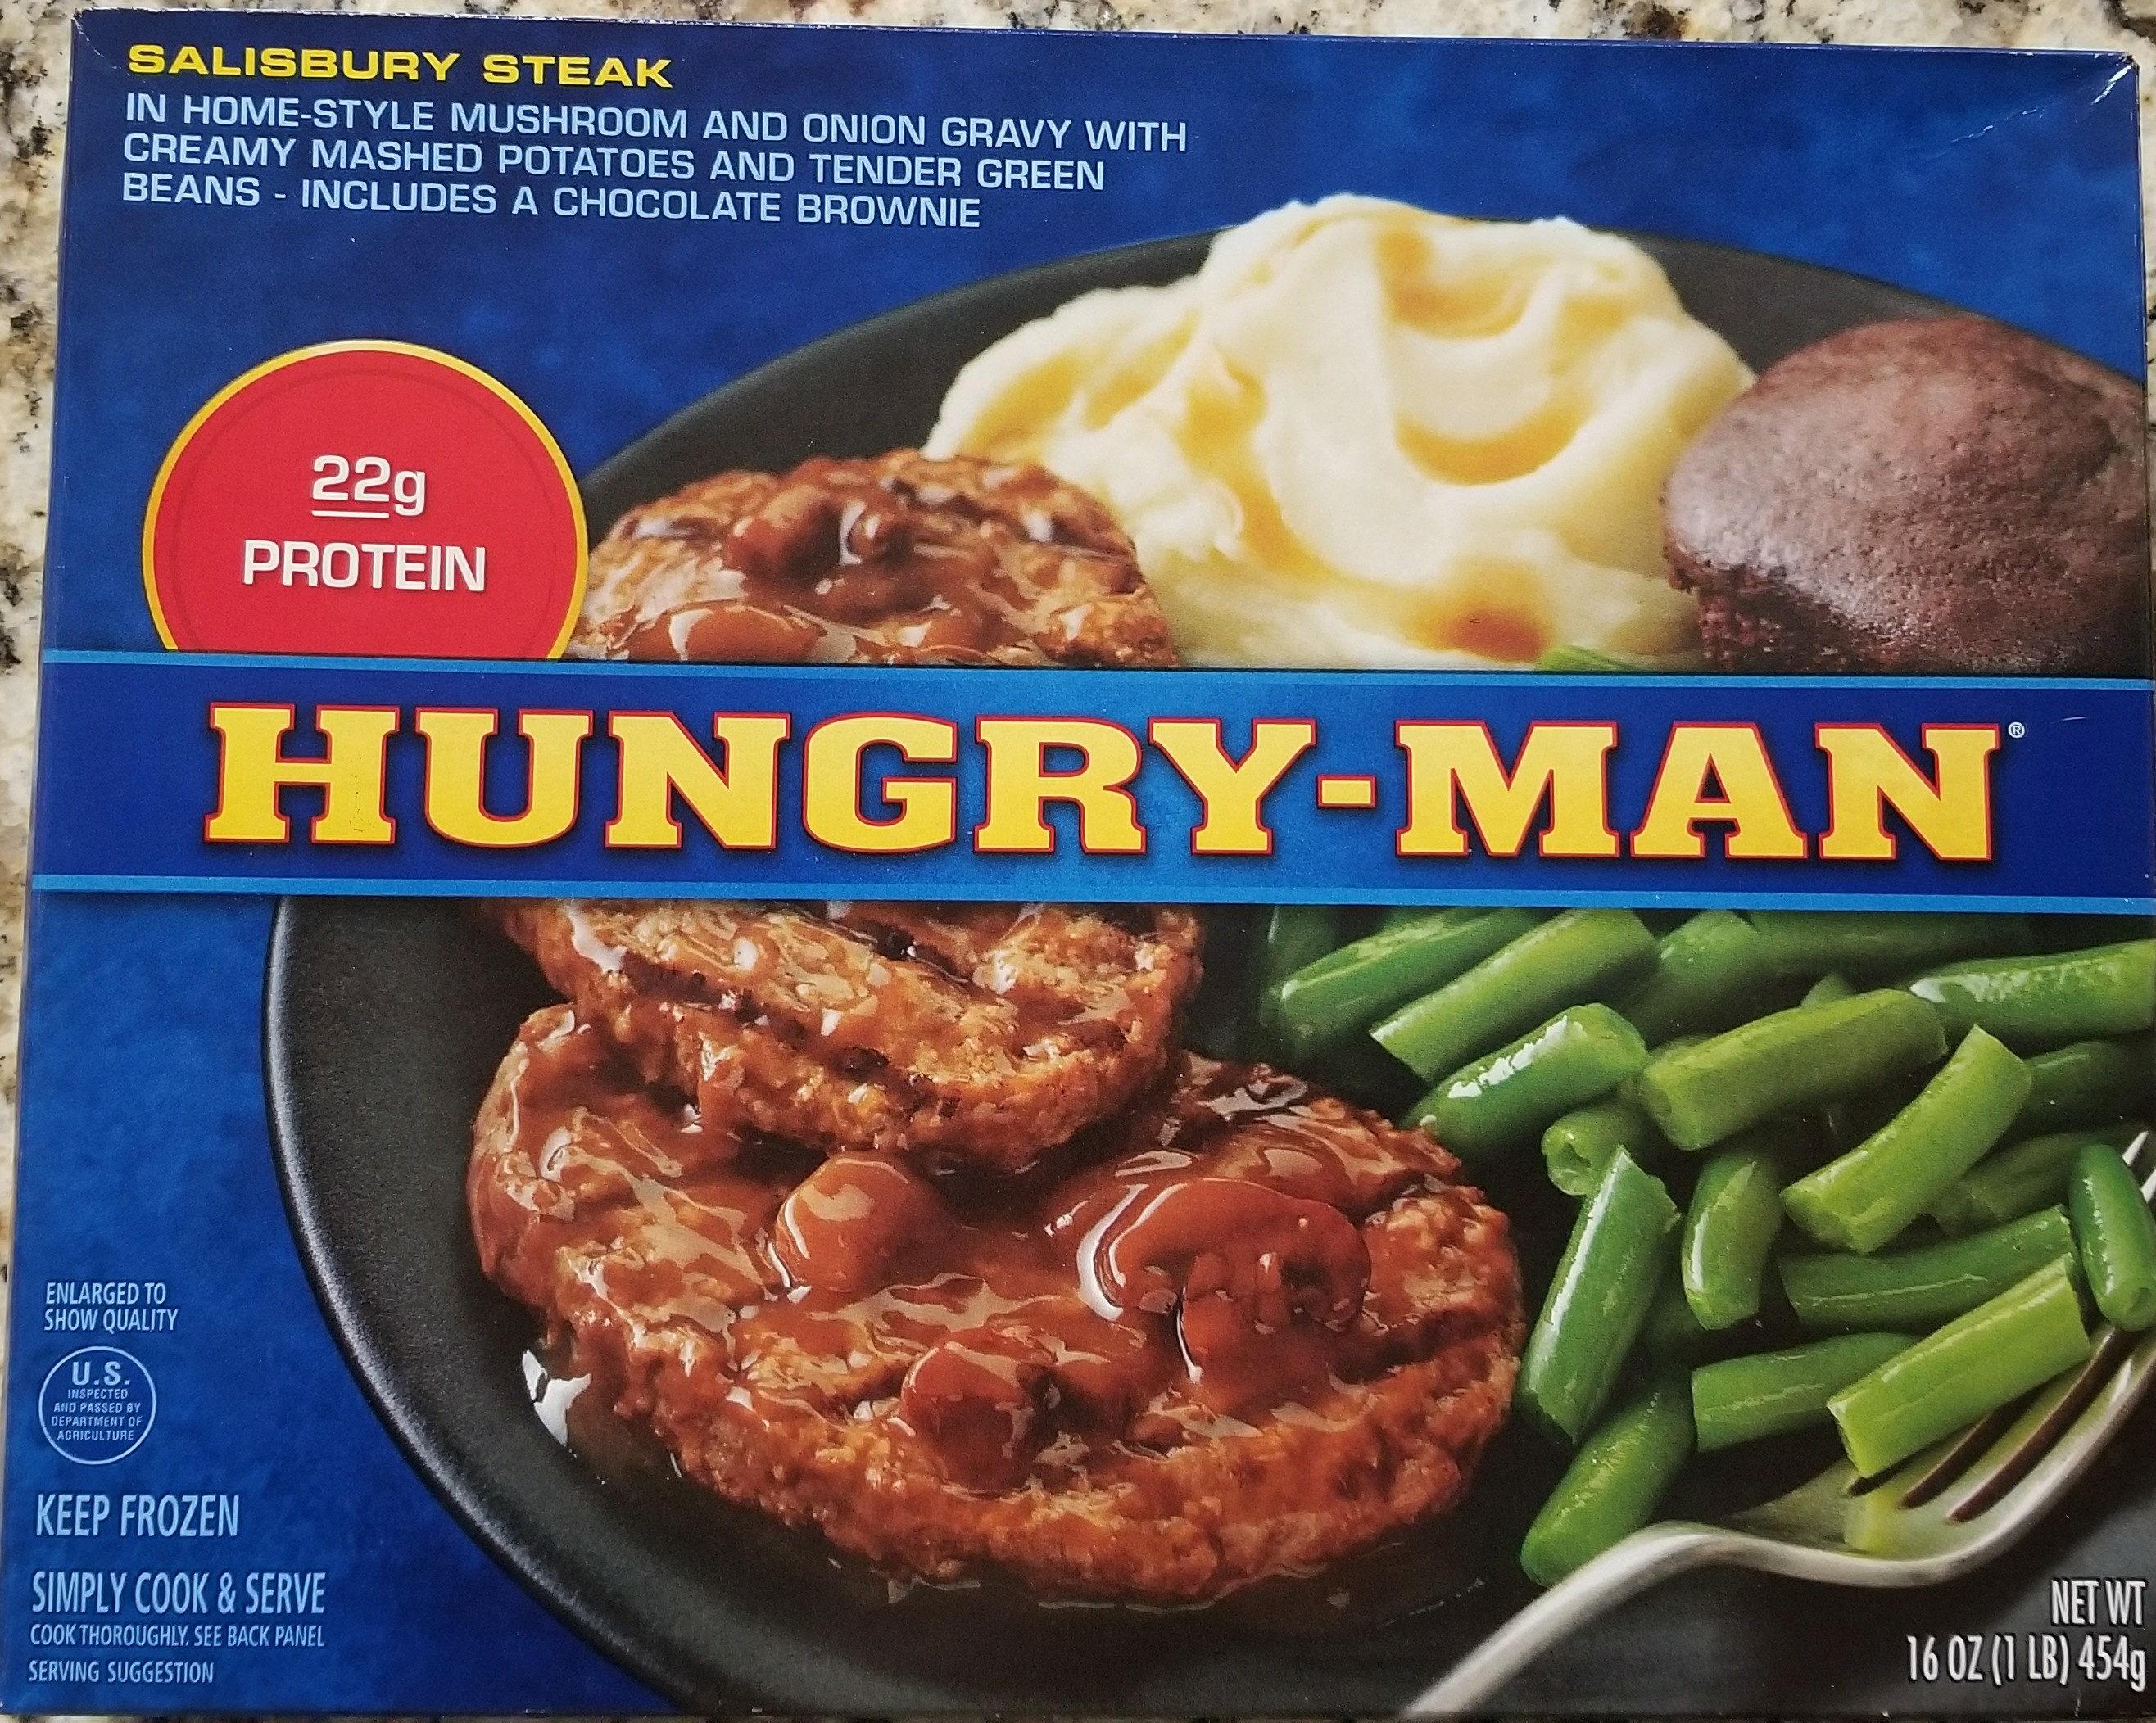 Hungry-Man Salisbury steak meal - Product - en